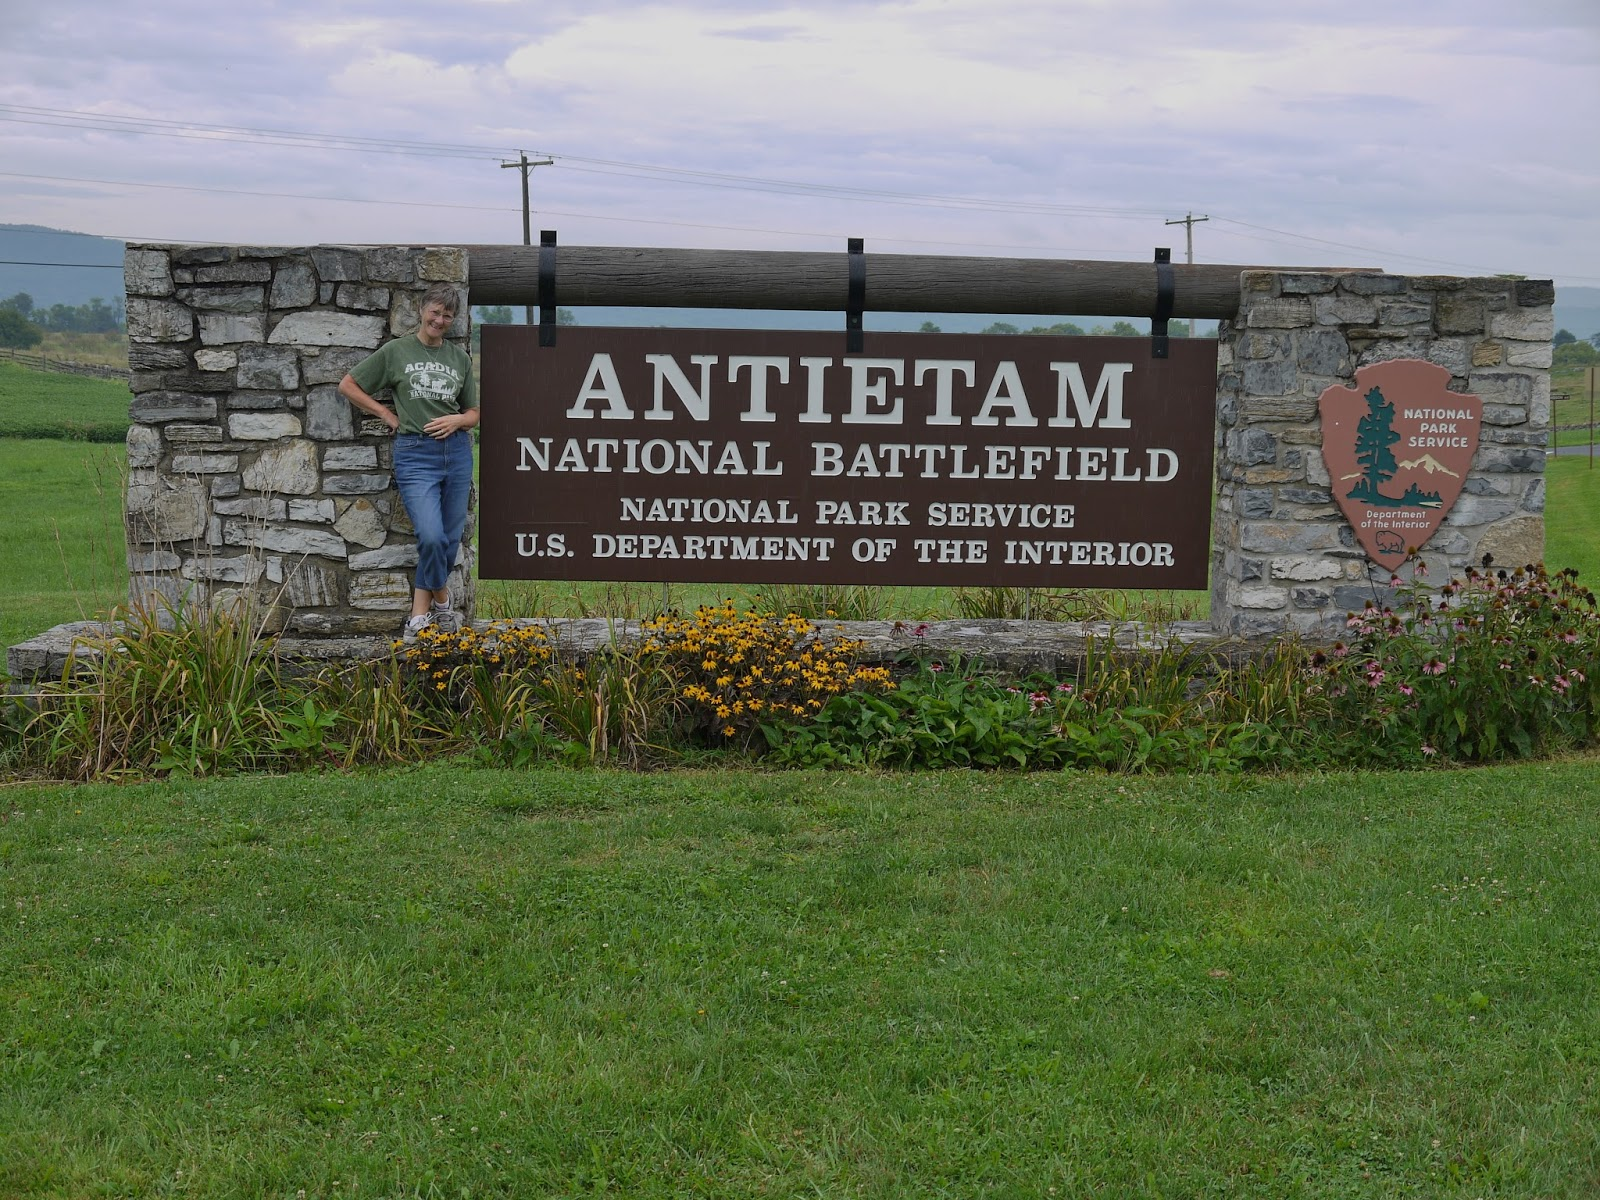 2dodges2go 8 19 13 Antietam Nb